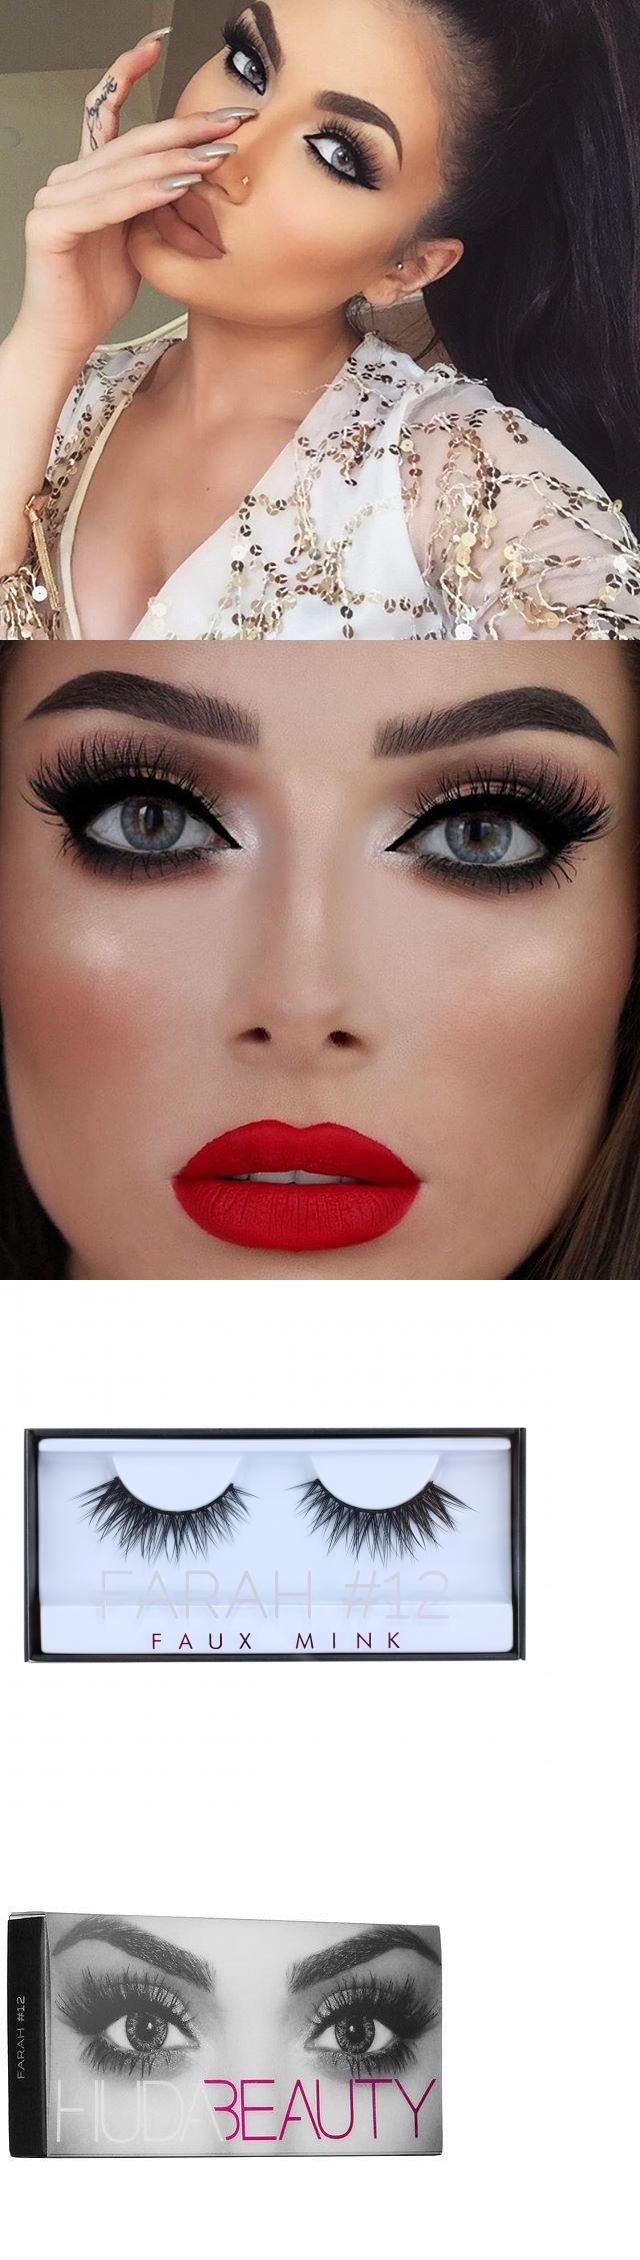 7b9986f09b2 False Eyelashes and Adhesives: Huda Beauty Faux Mink Eyelashes Farah #12  New In Box Authentic BUY IT NOW ONLY: $35.5